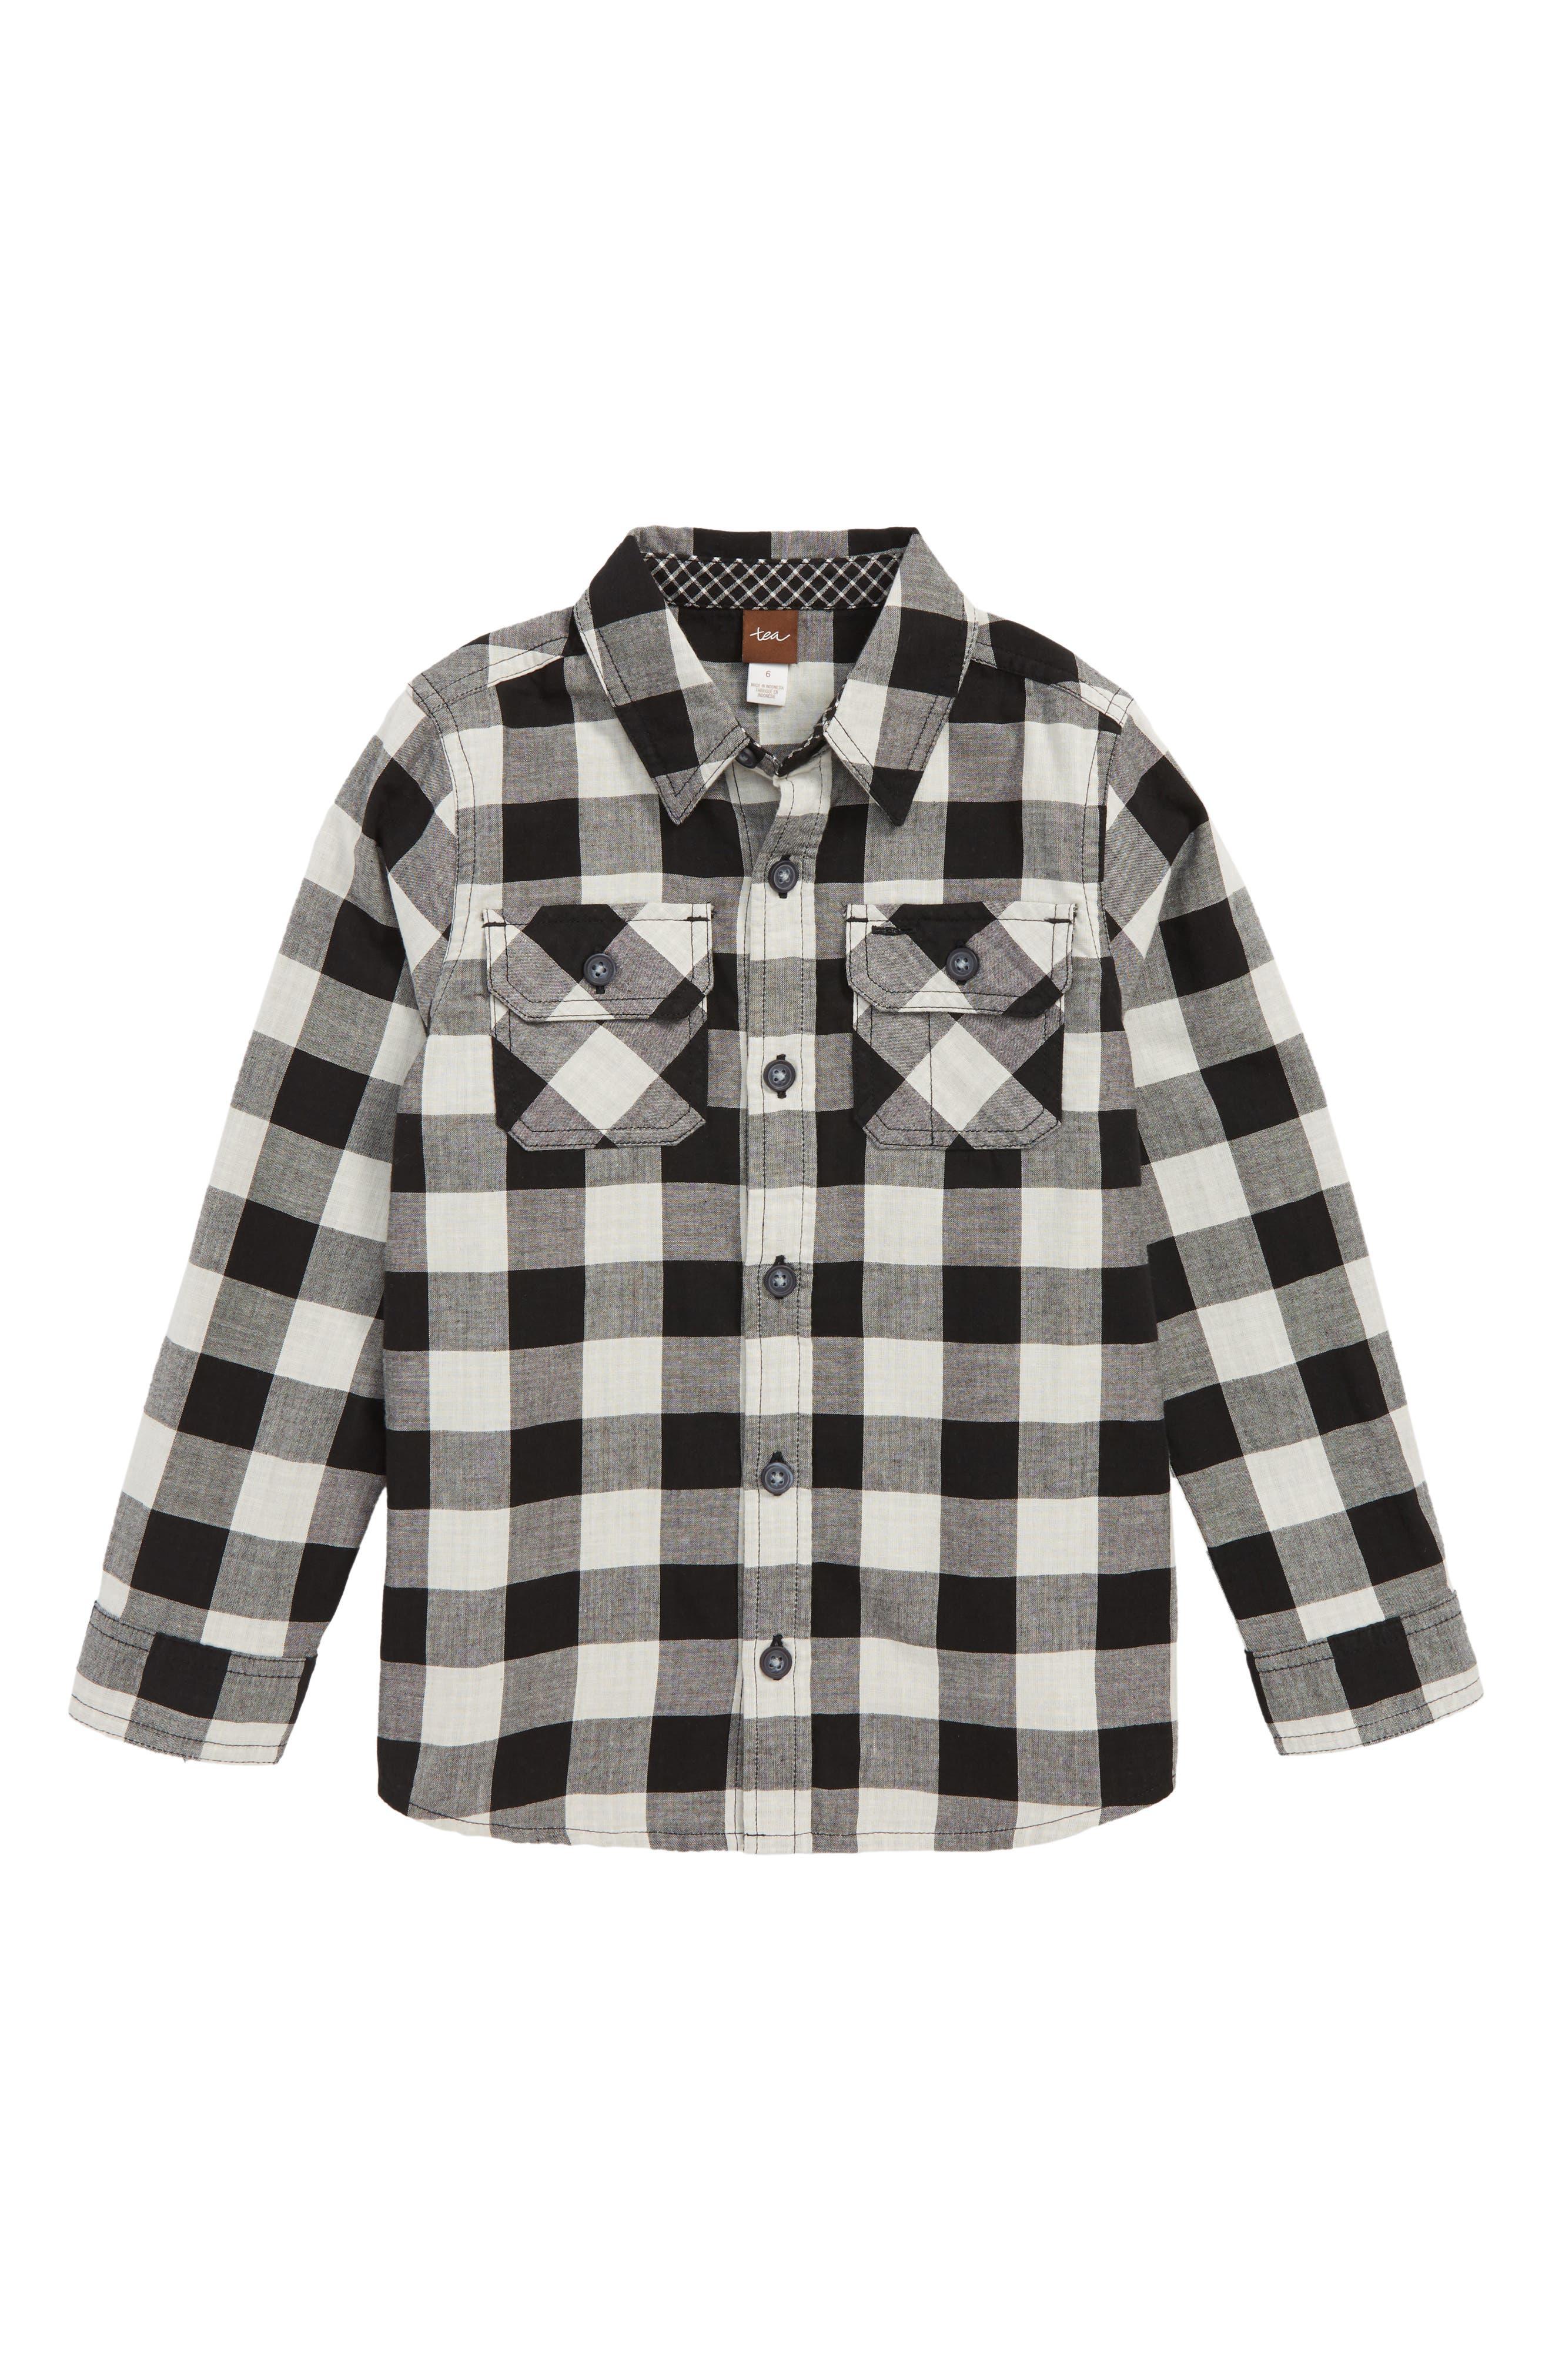 Double Weave Plaid Shirt,                         Main,                         color, CHECKERED PLAID